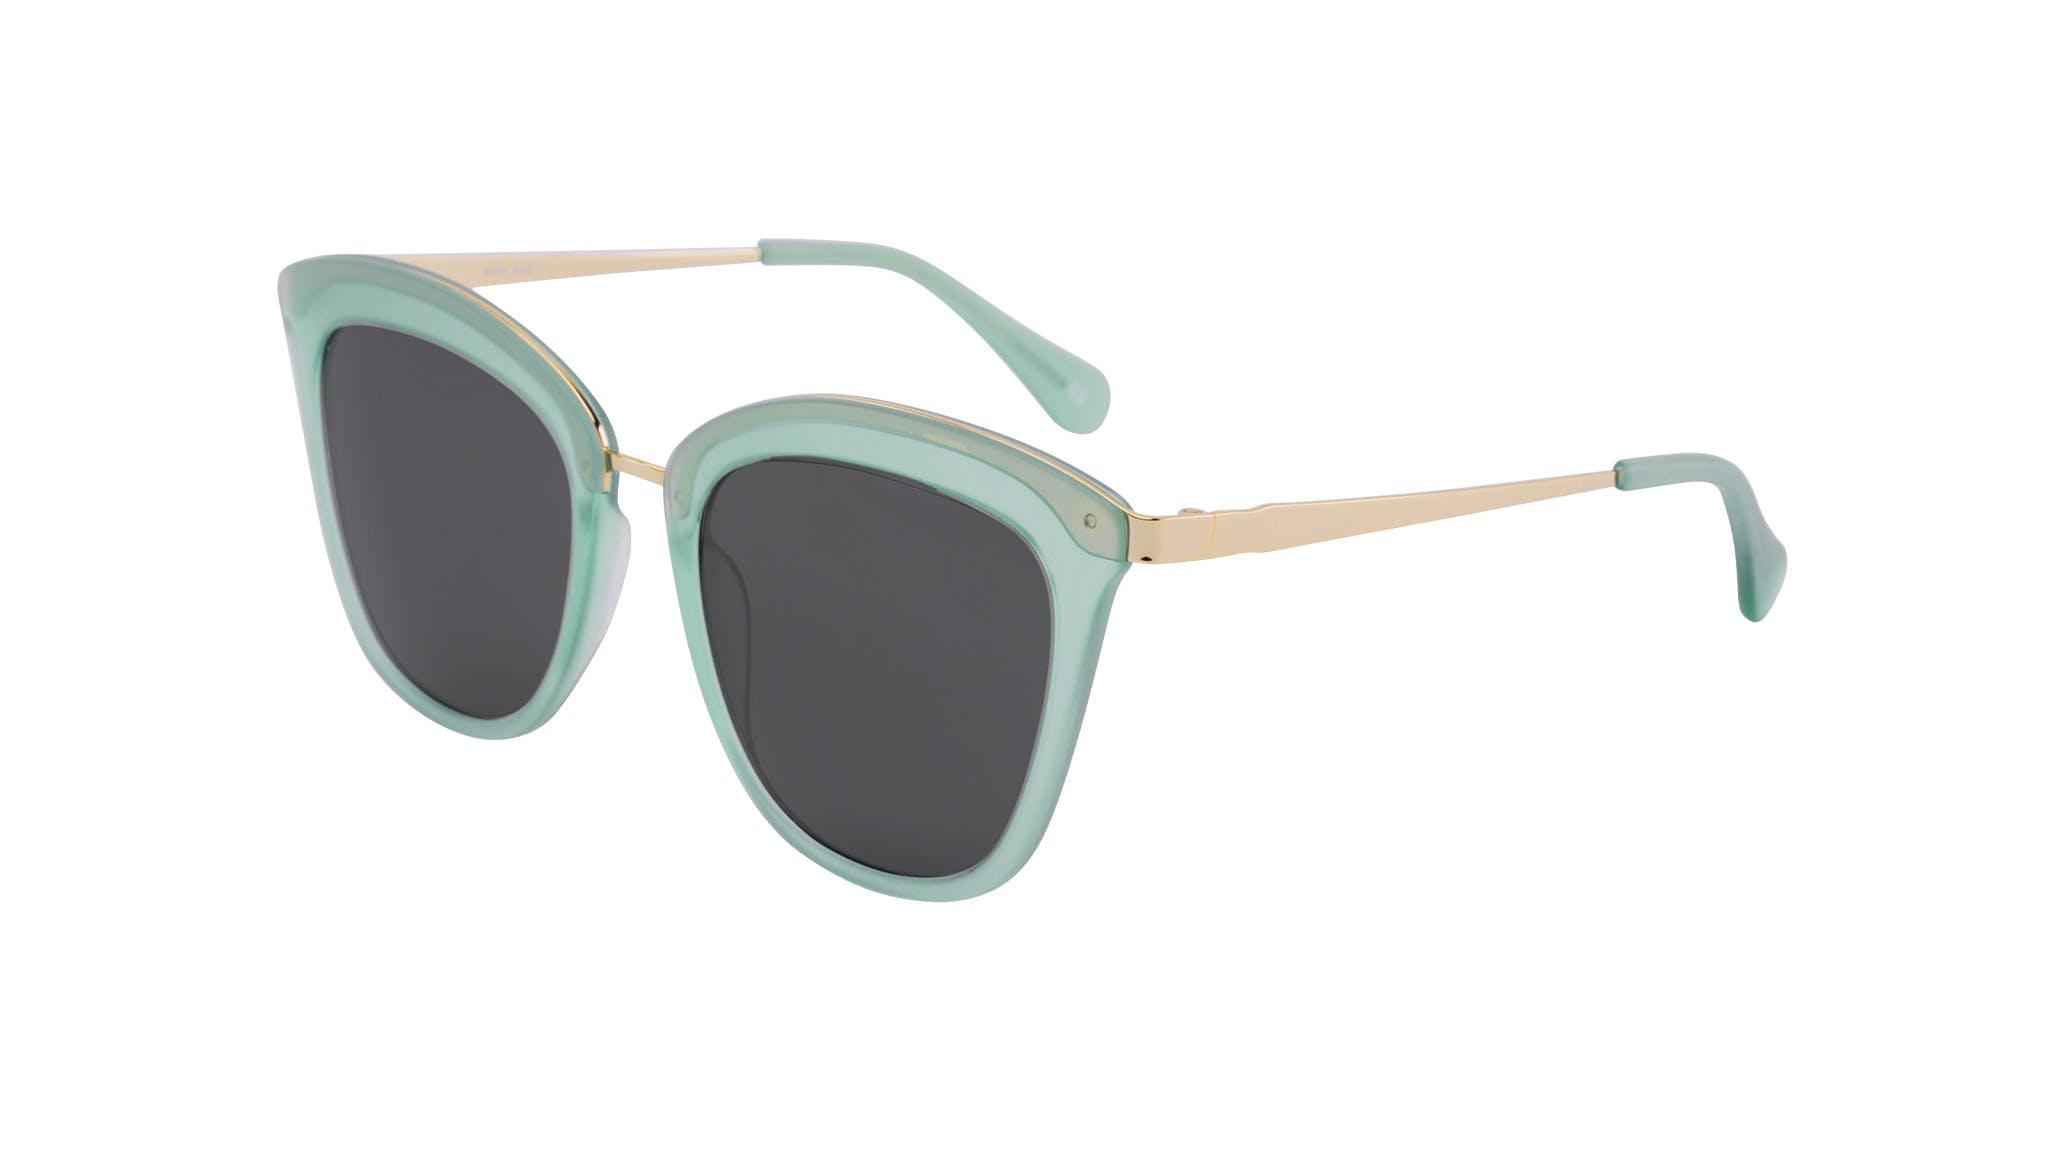 Affordable Fashion Glasses Rectangle Square Sunglasses Women More Sage Tilt